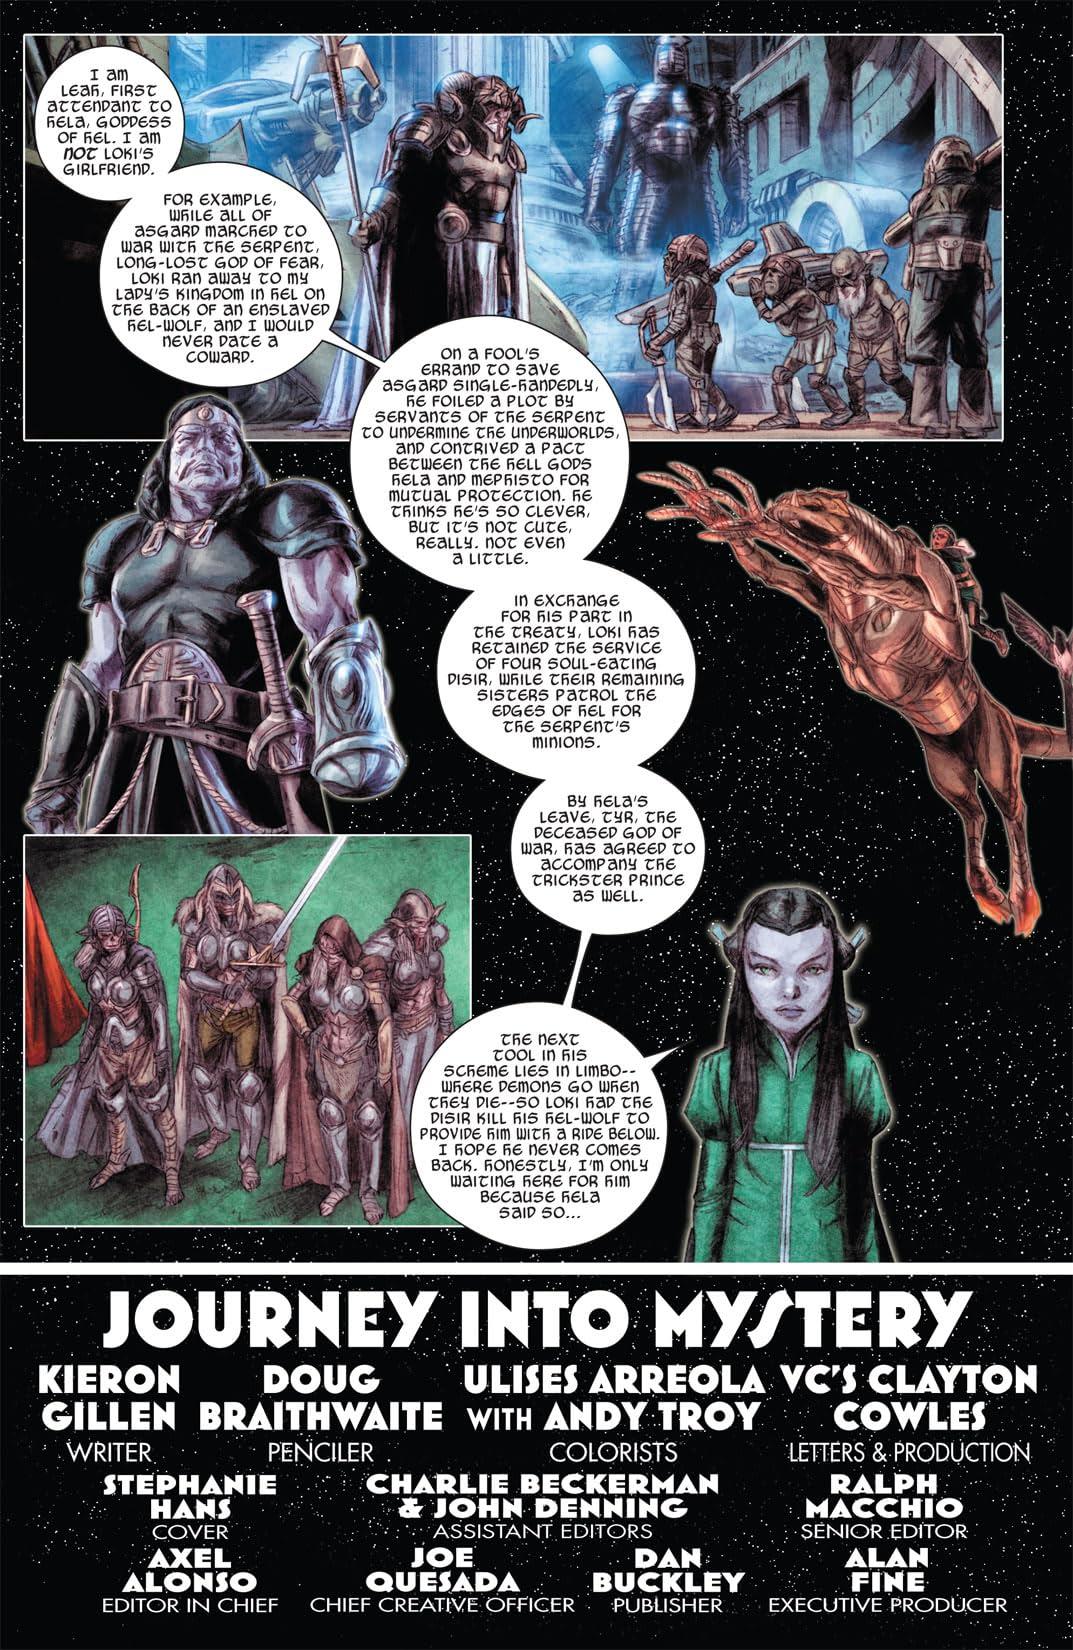 Journey Into Mystery #626